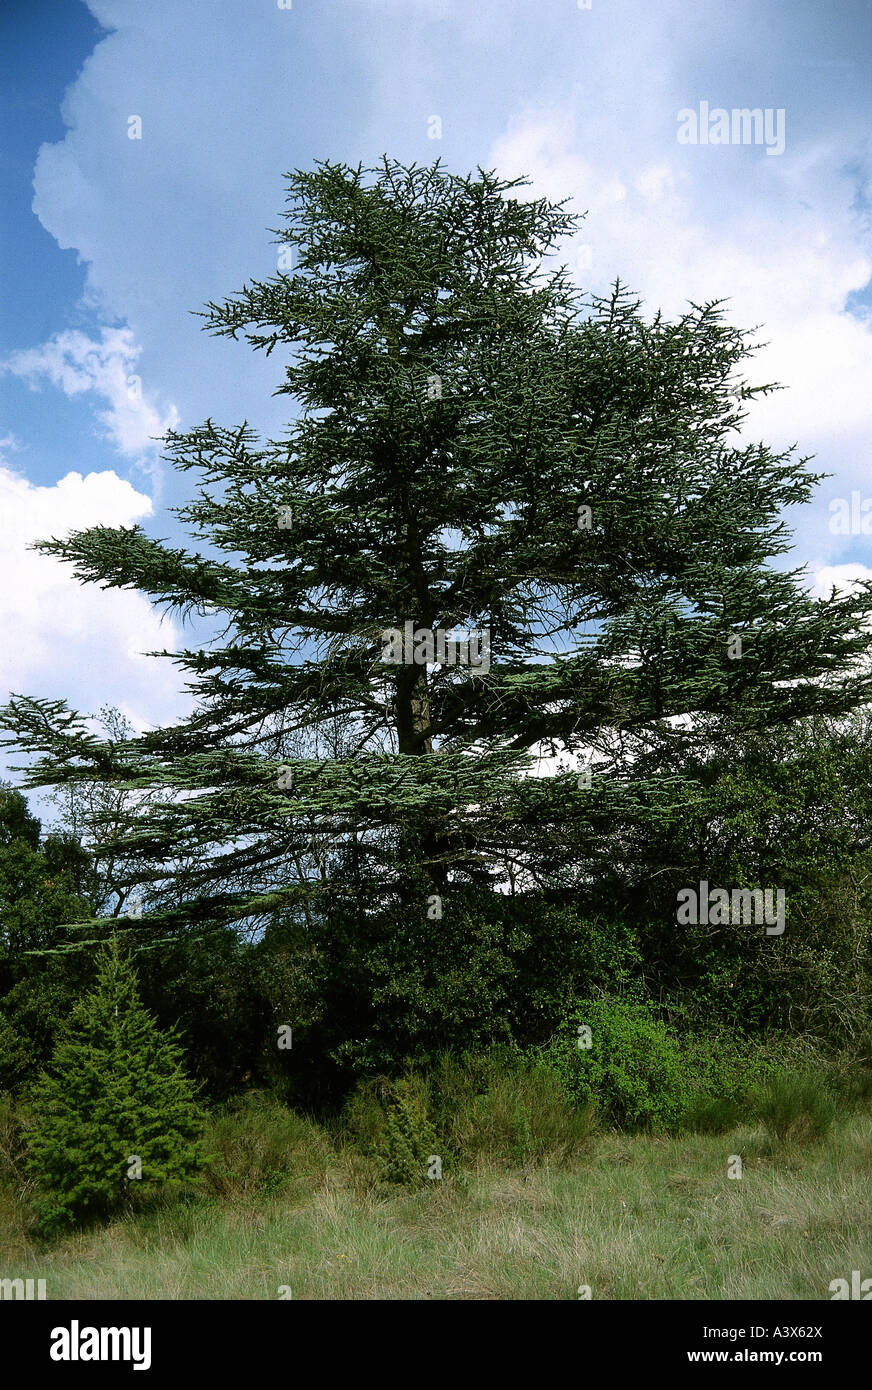 botany, Cedar, (Cedrus), Lebanon Cedar, (Cedrus libani), tree, Pinaceae, Pinaophyta, Coniferales, green, Pinales, - Stock Image